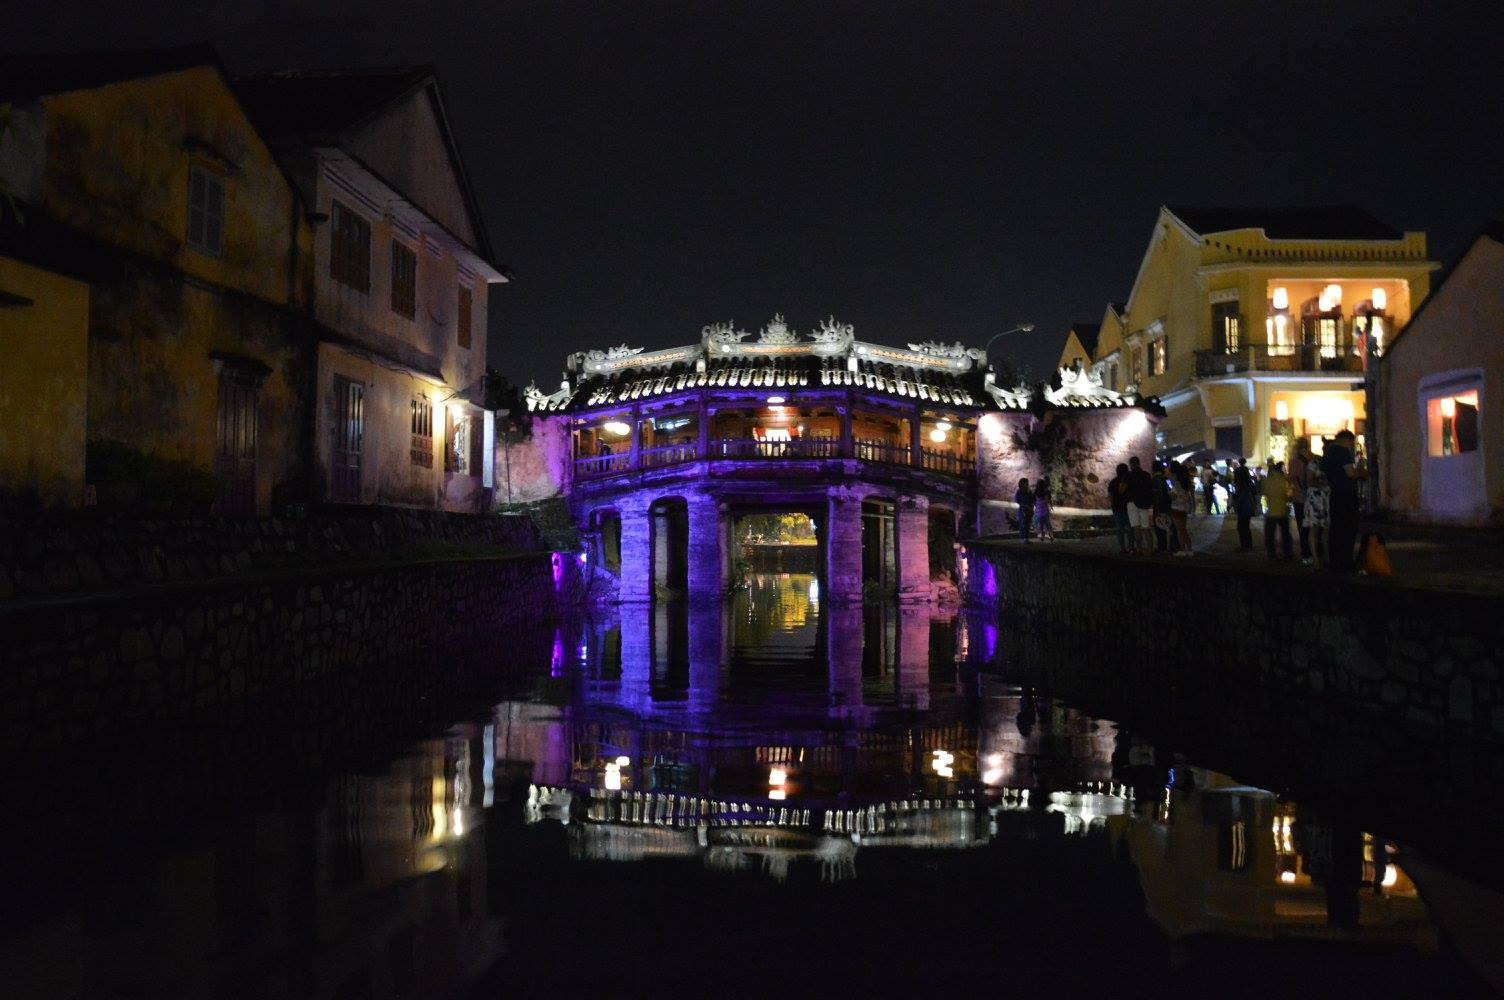 Ponte cinese d'ingresso città antica